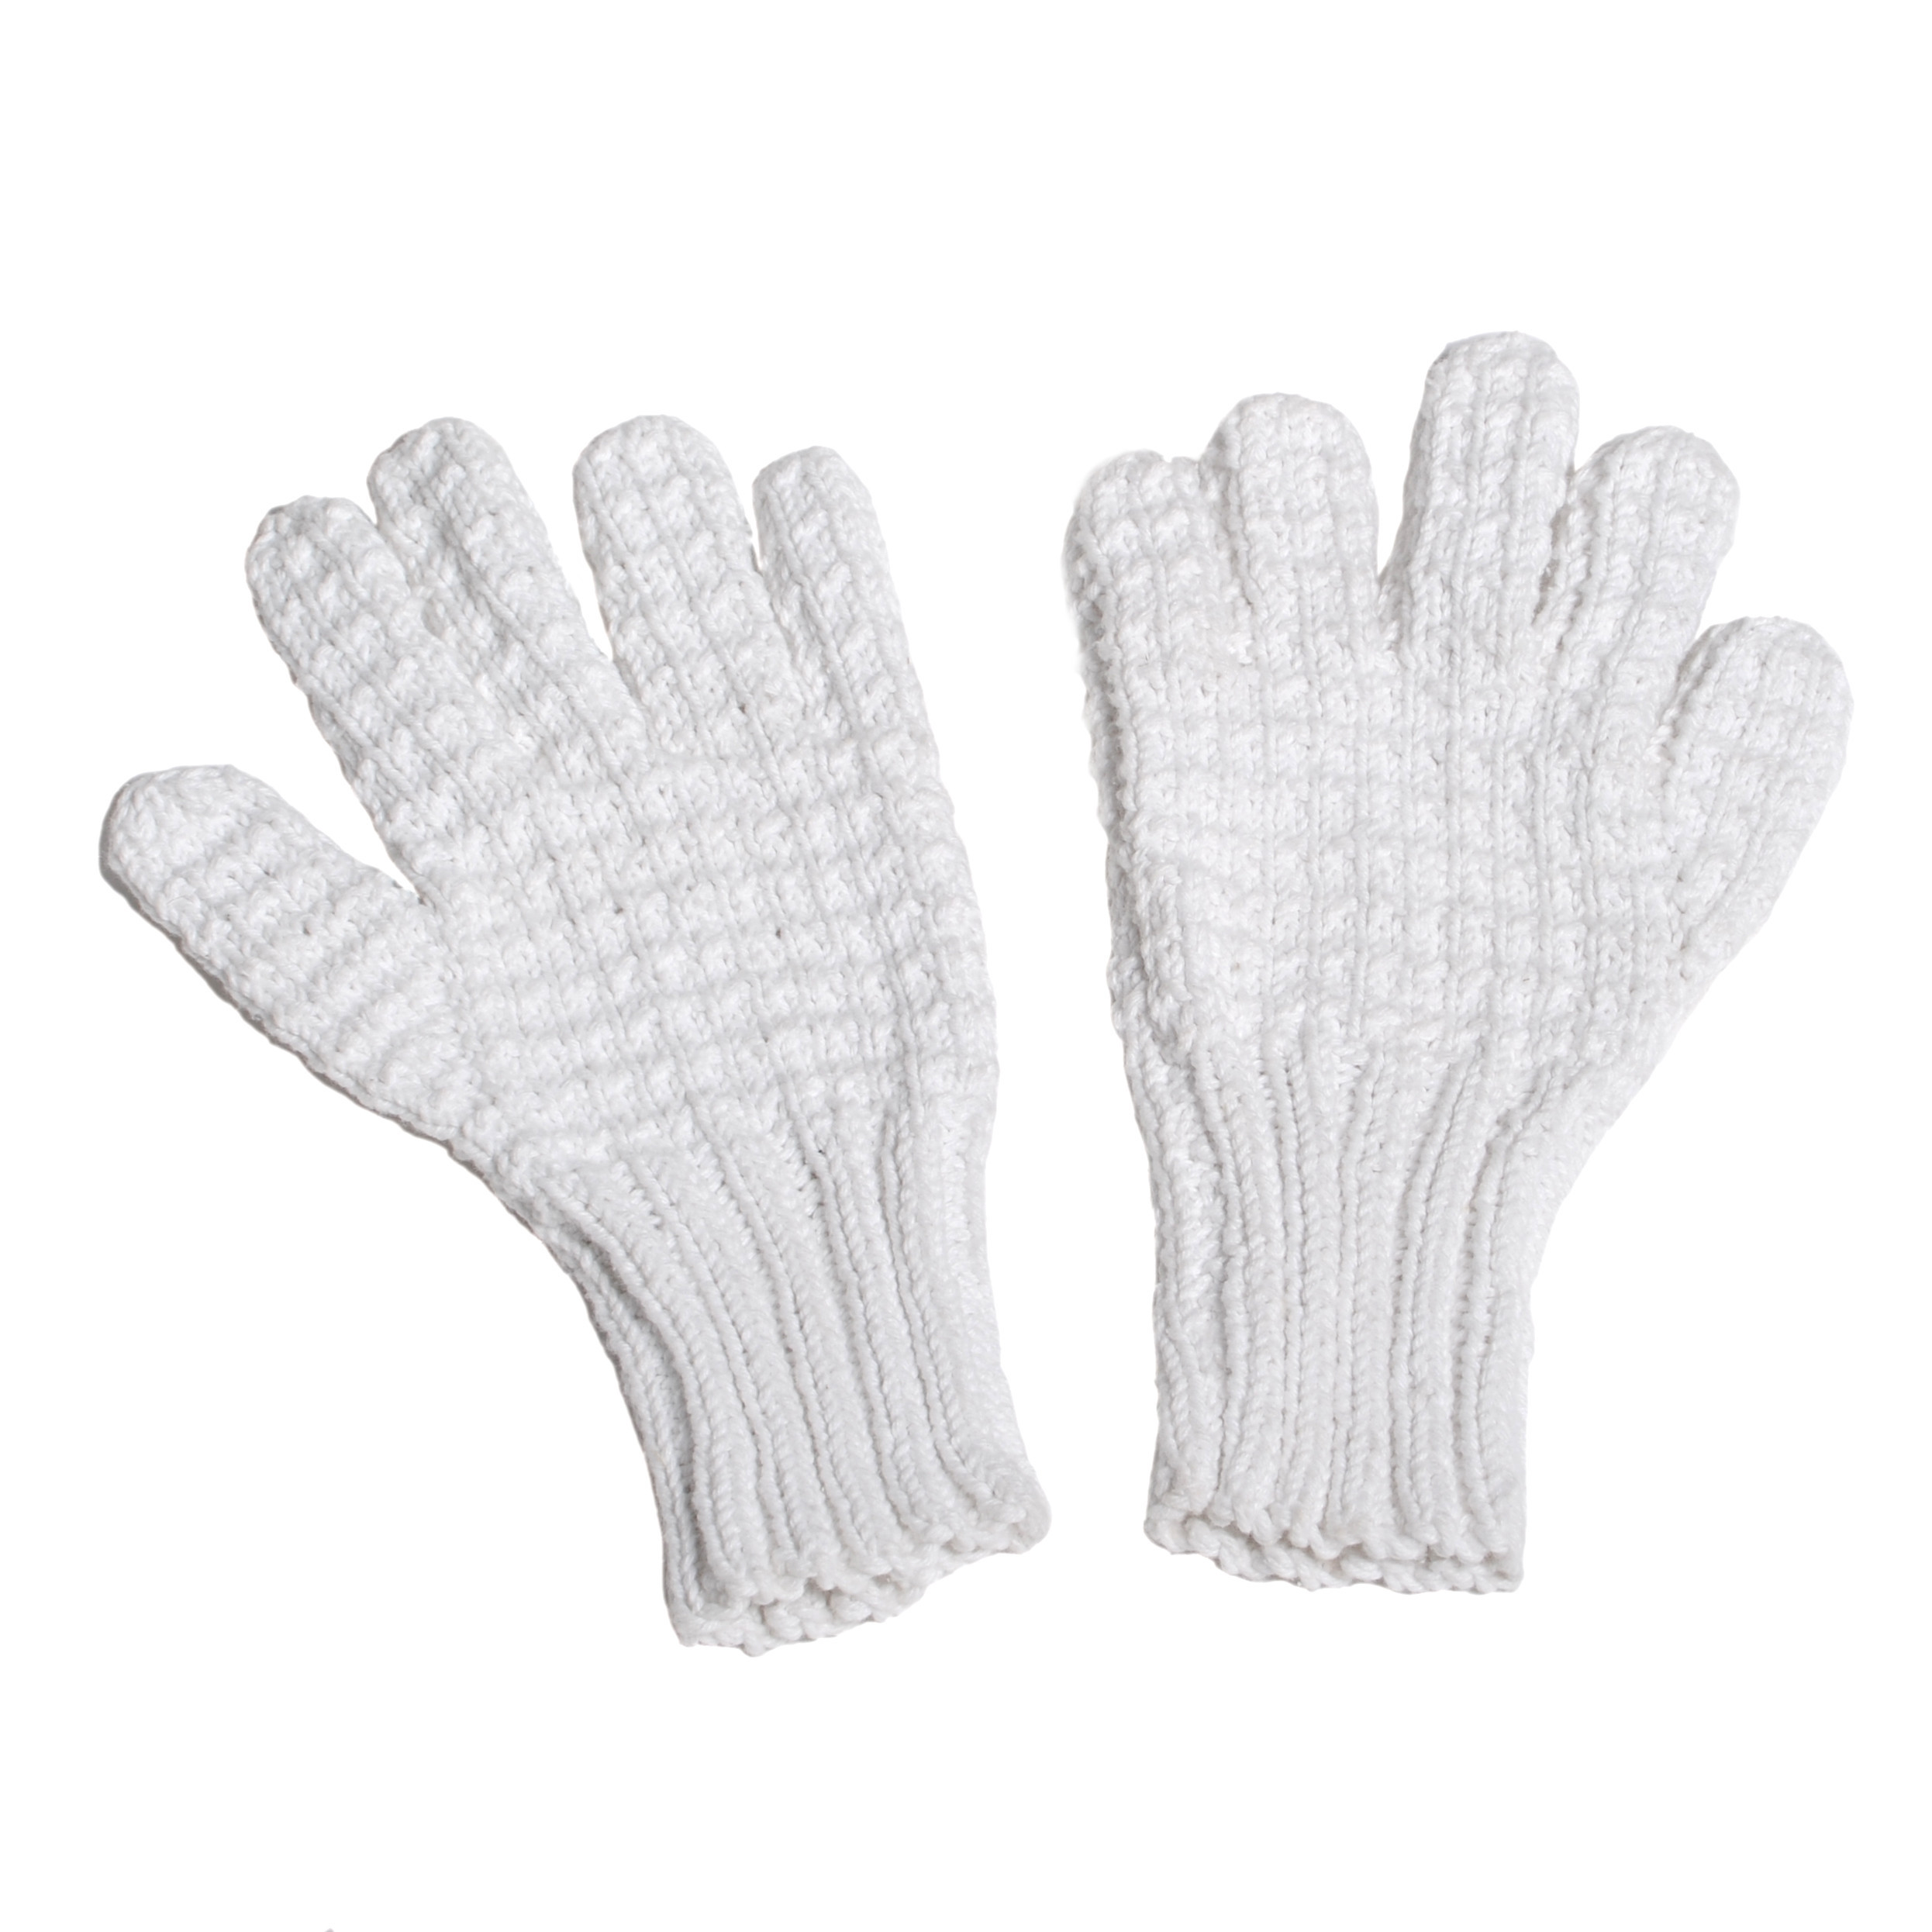 Gants au crochet - Fait main